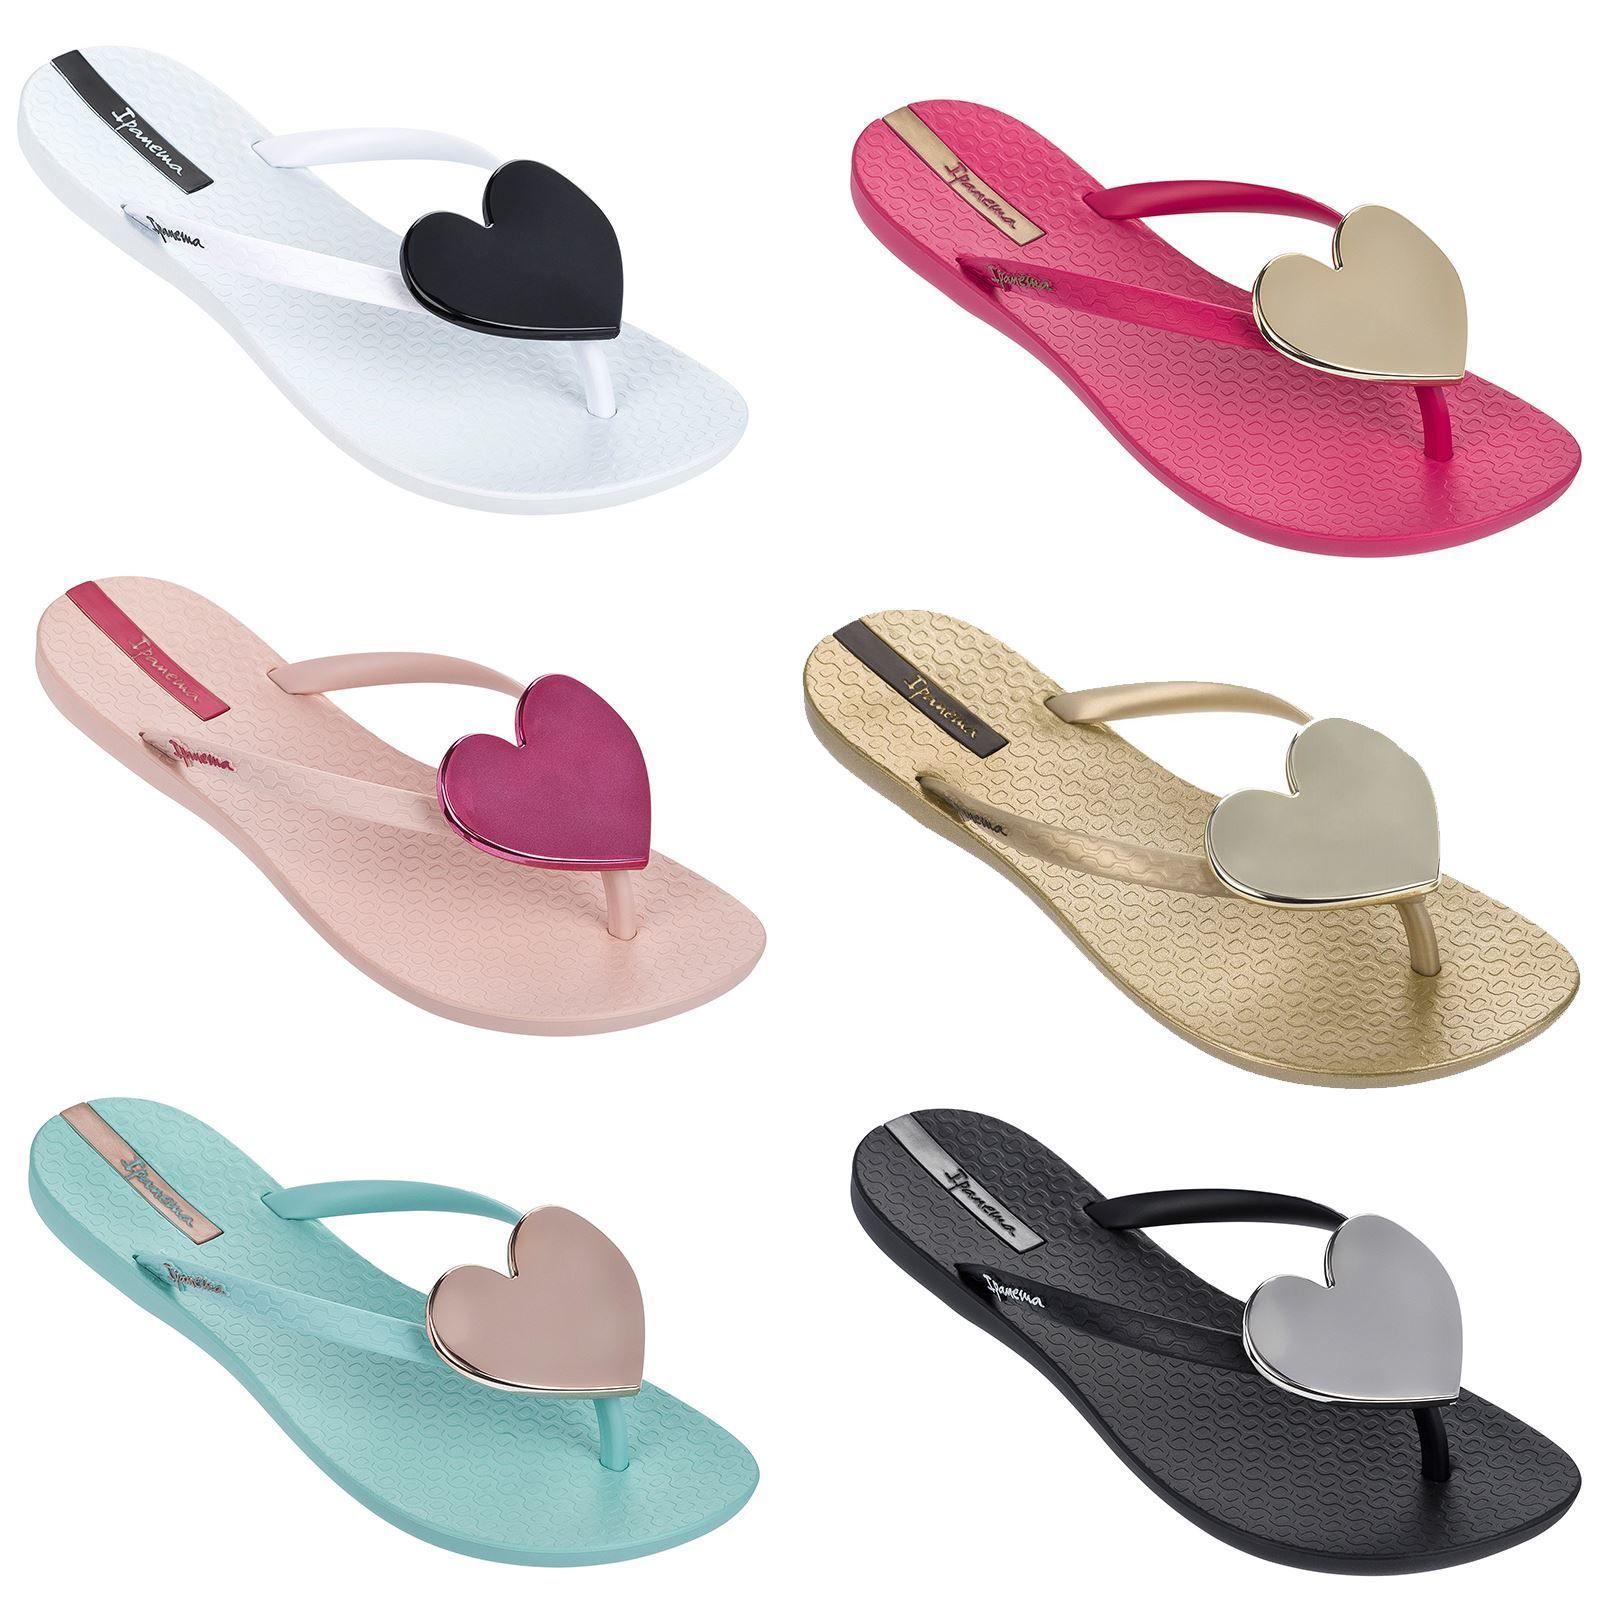 cfe942a387d Wave Maxi Heart Flip Flops Slim Footbed Beach Sandals beach  slipper footwear thongs